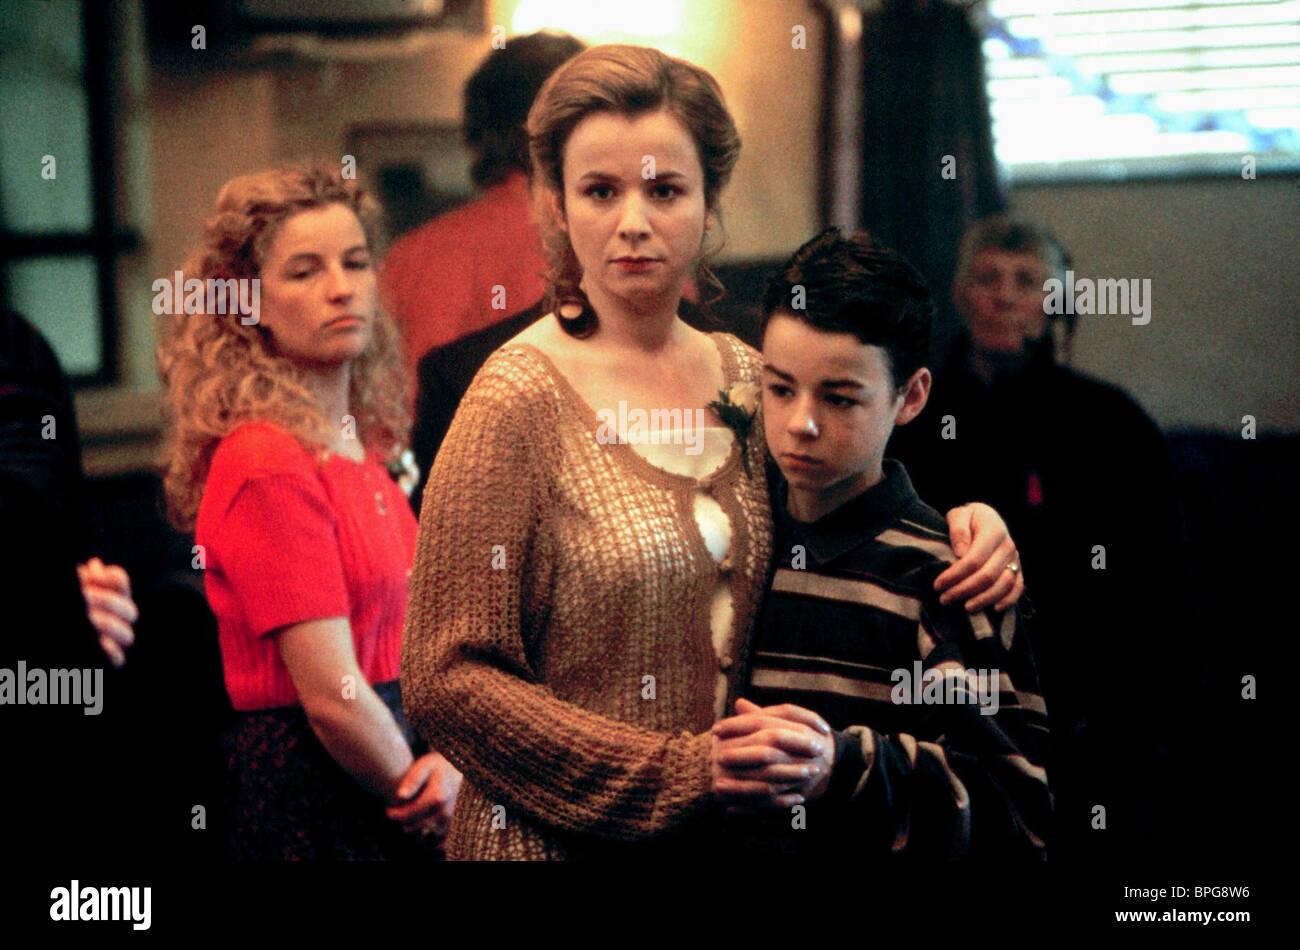 EMILY WATSON, el boxeador (1997) Imagen De Stock